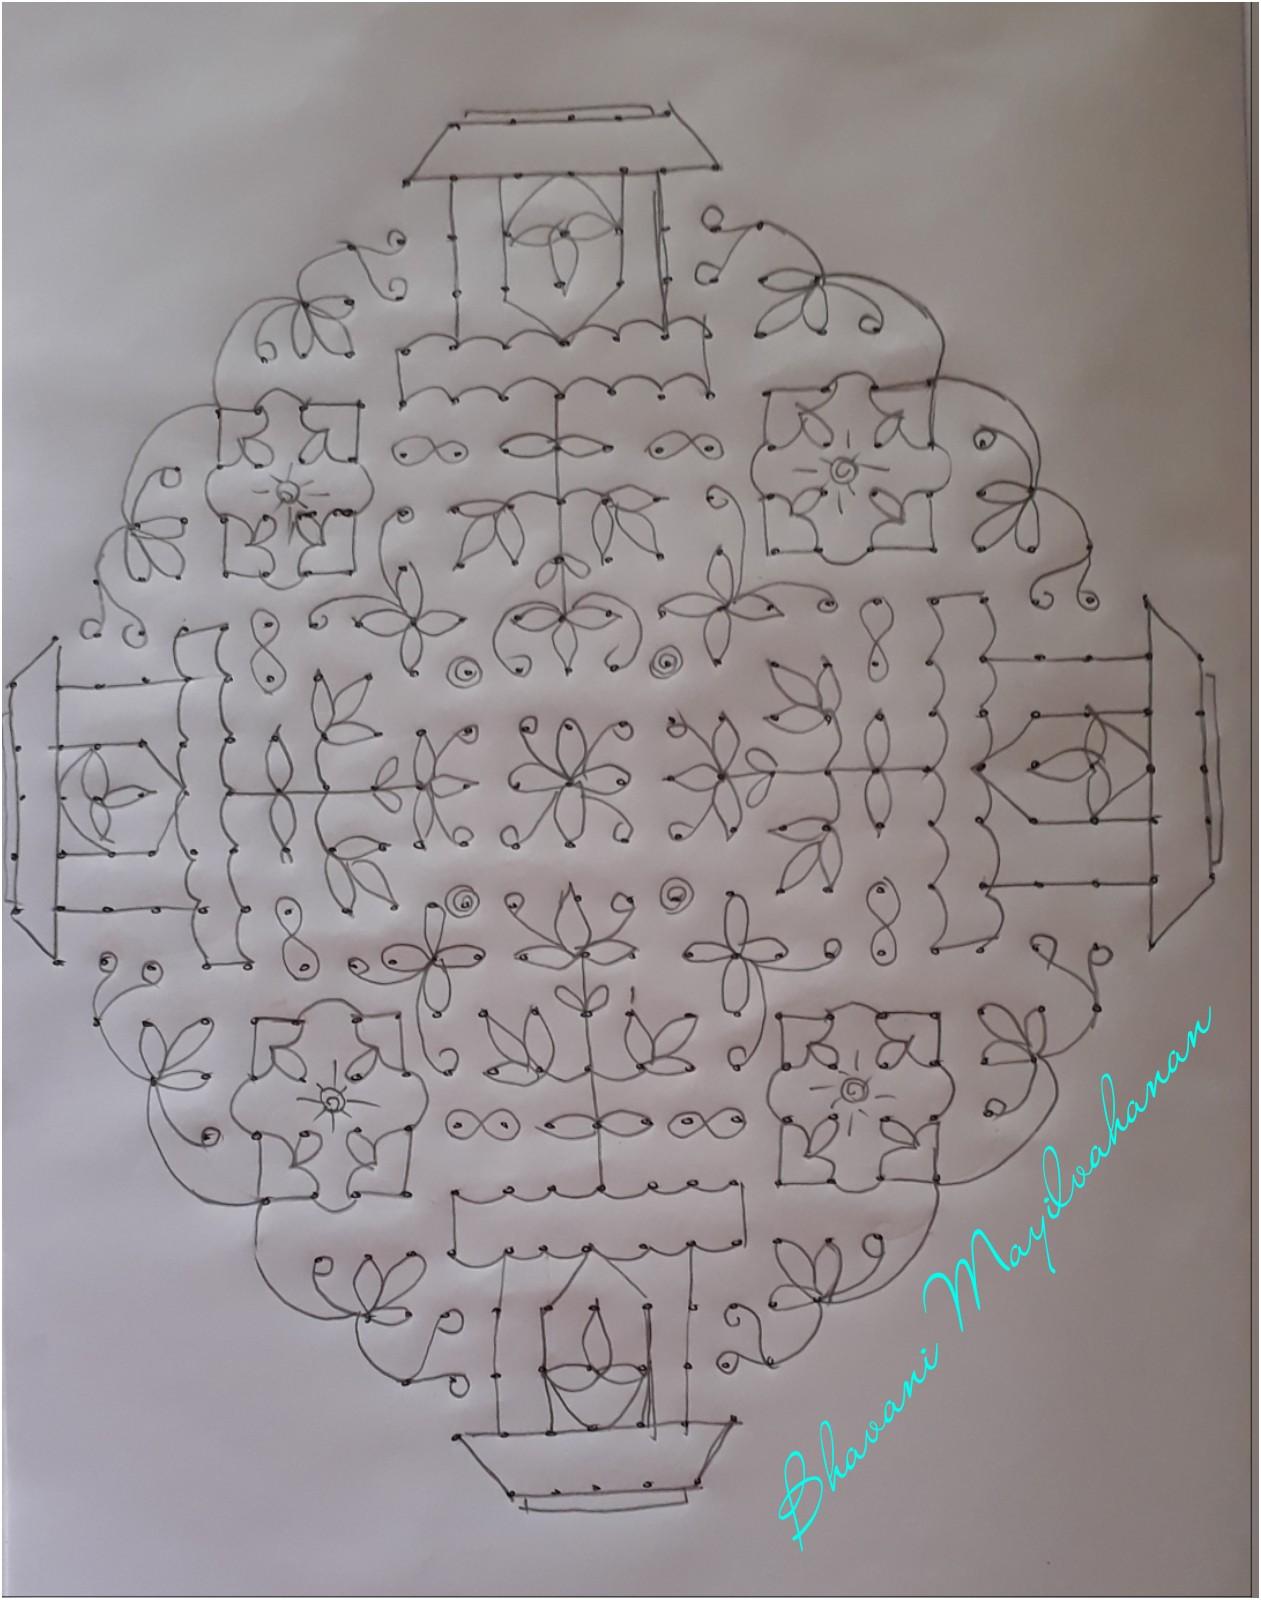 CONTEST KOLAM 3 - துளசி மாடம் || 25 Dots contest Kolam